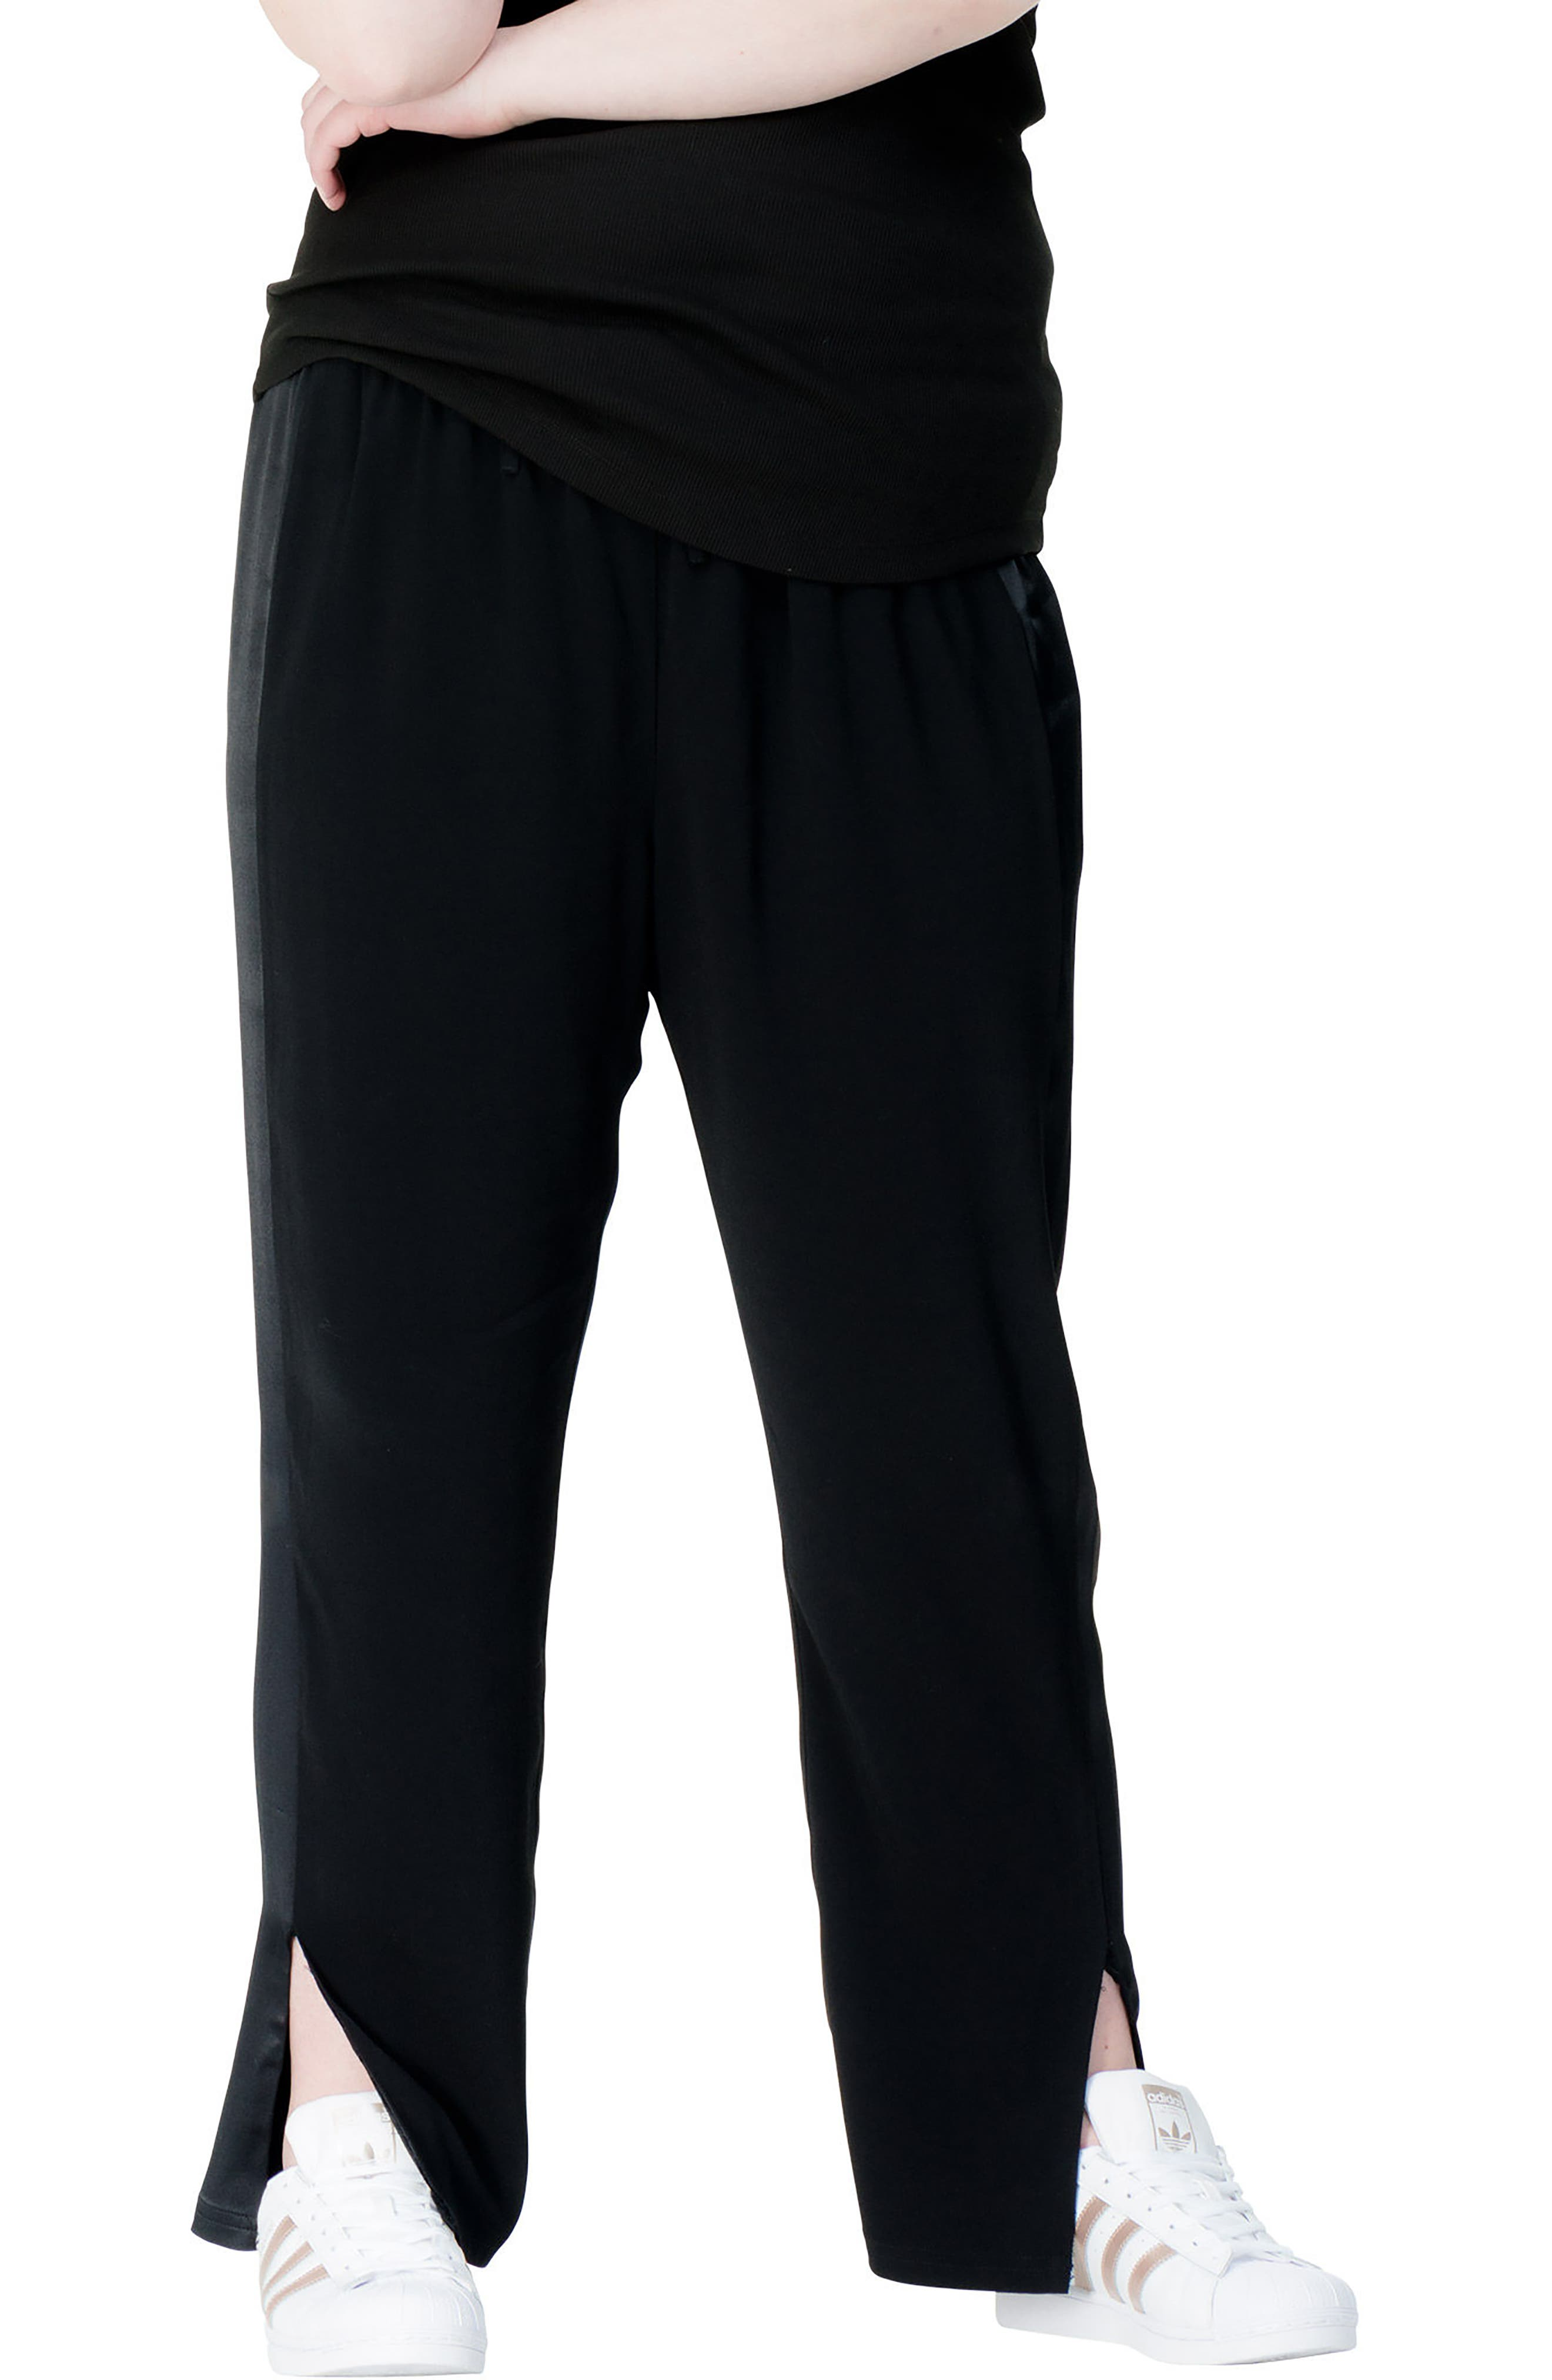 UNIVERSAL STANDARD Beaufort Track Pants (Plus Size)